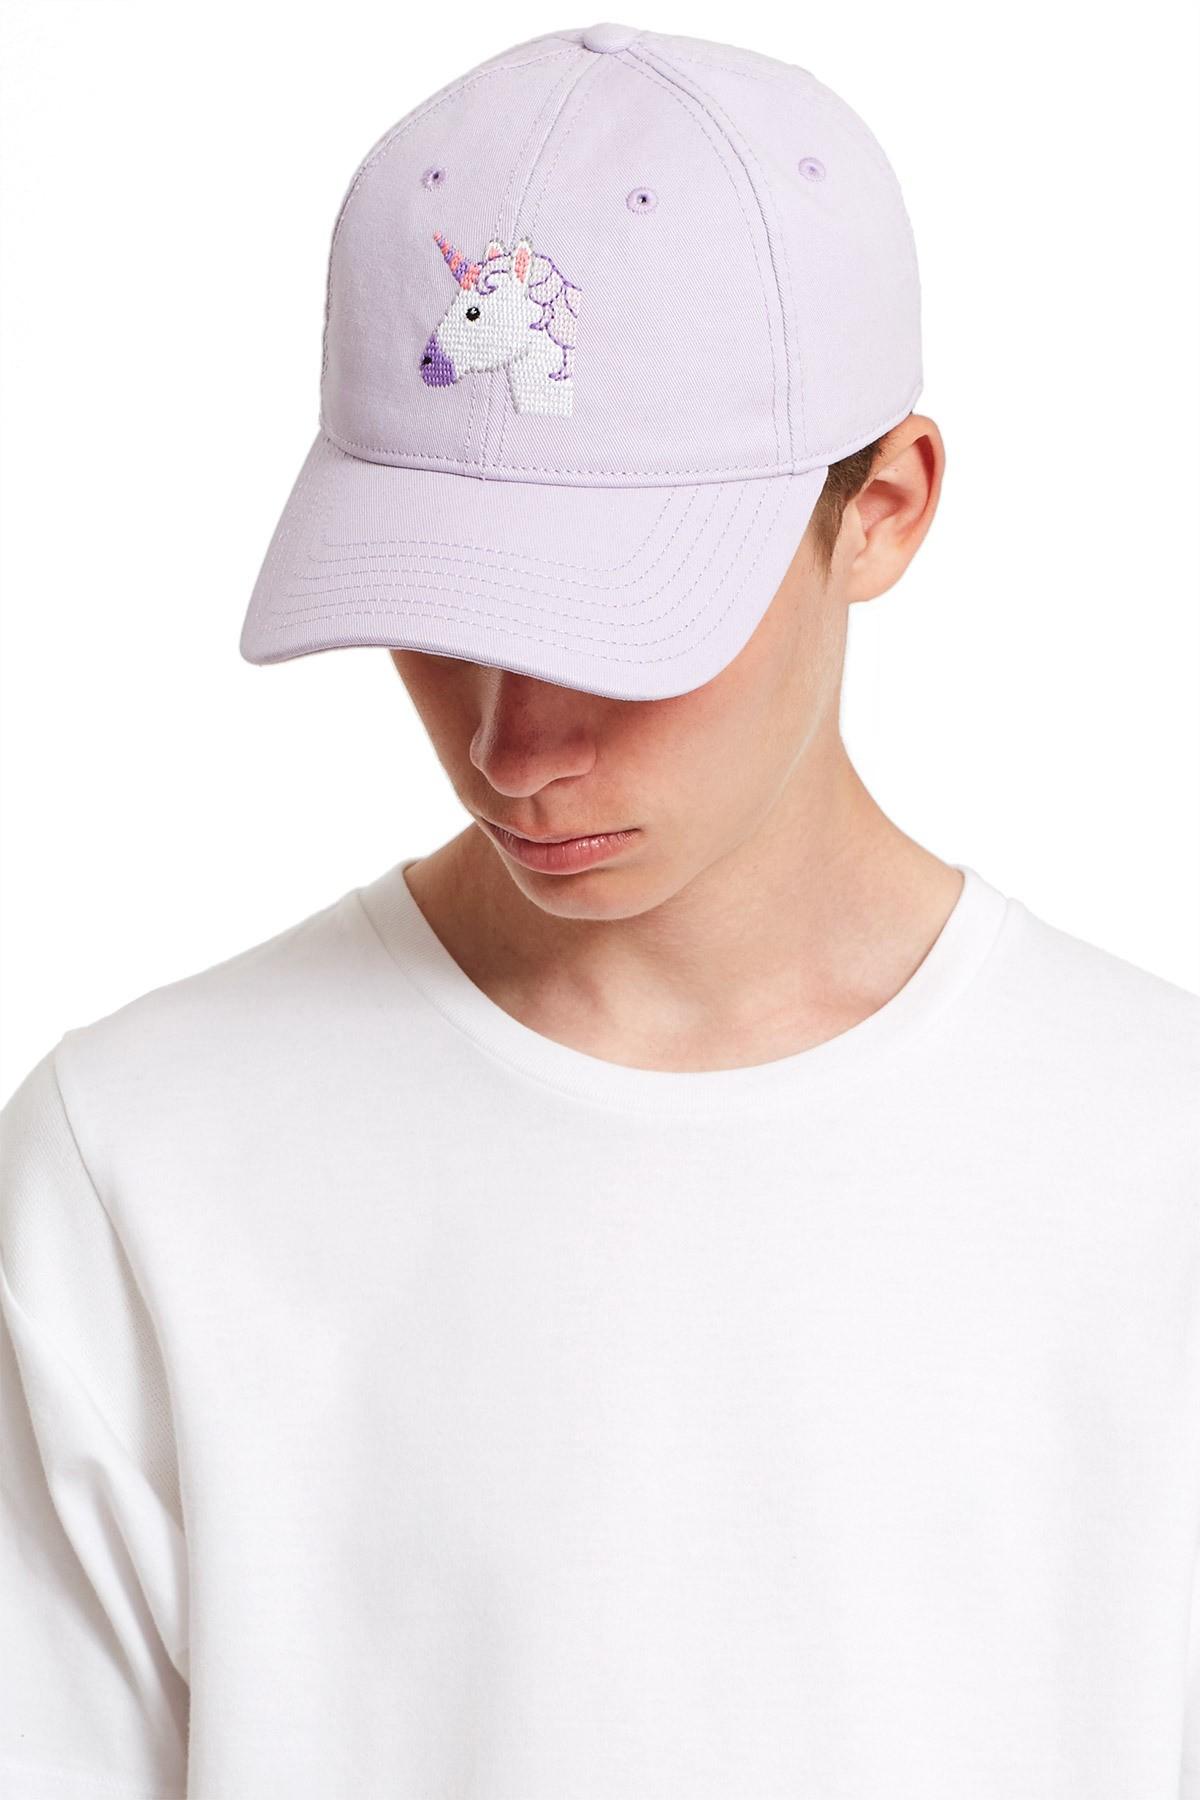 c97ceb61e37 Opening Ceremony Unicorn Hat - Light Purple